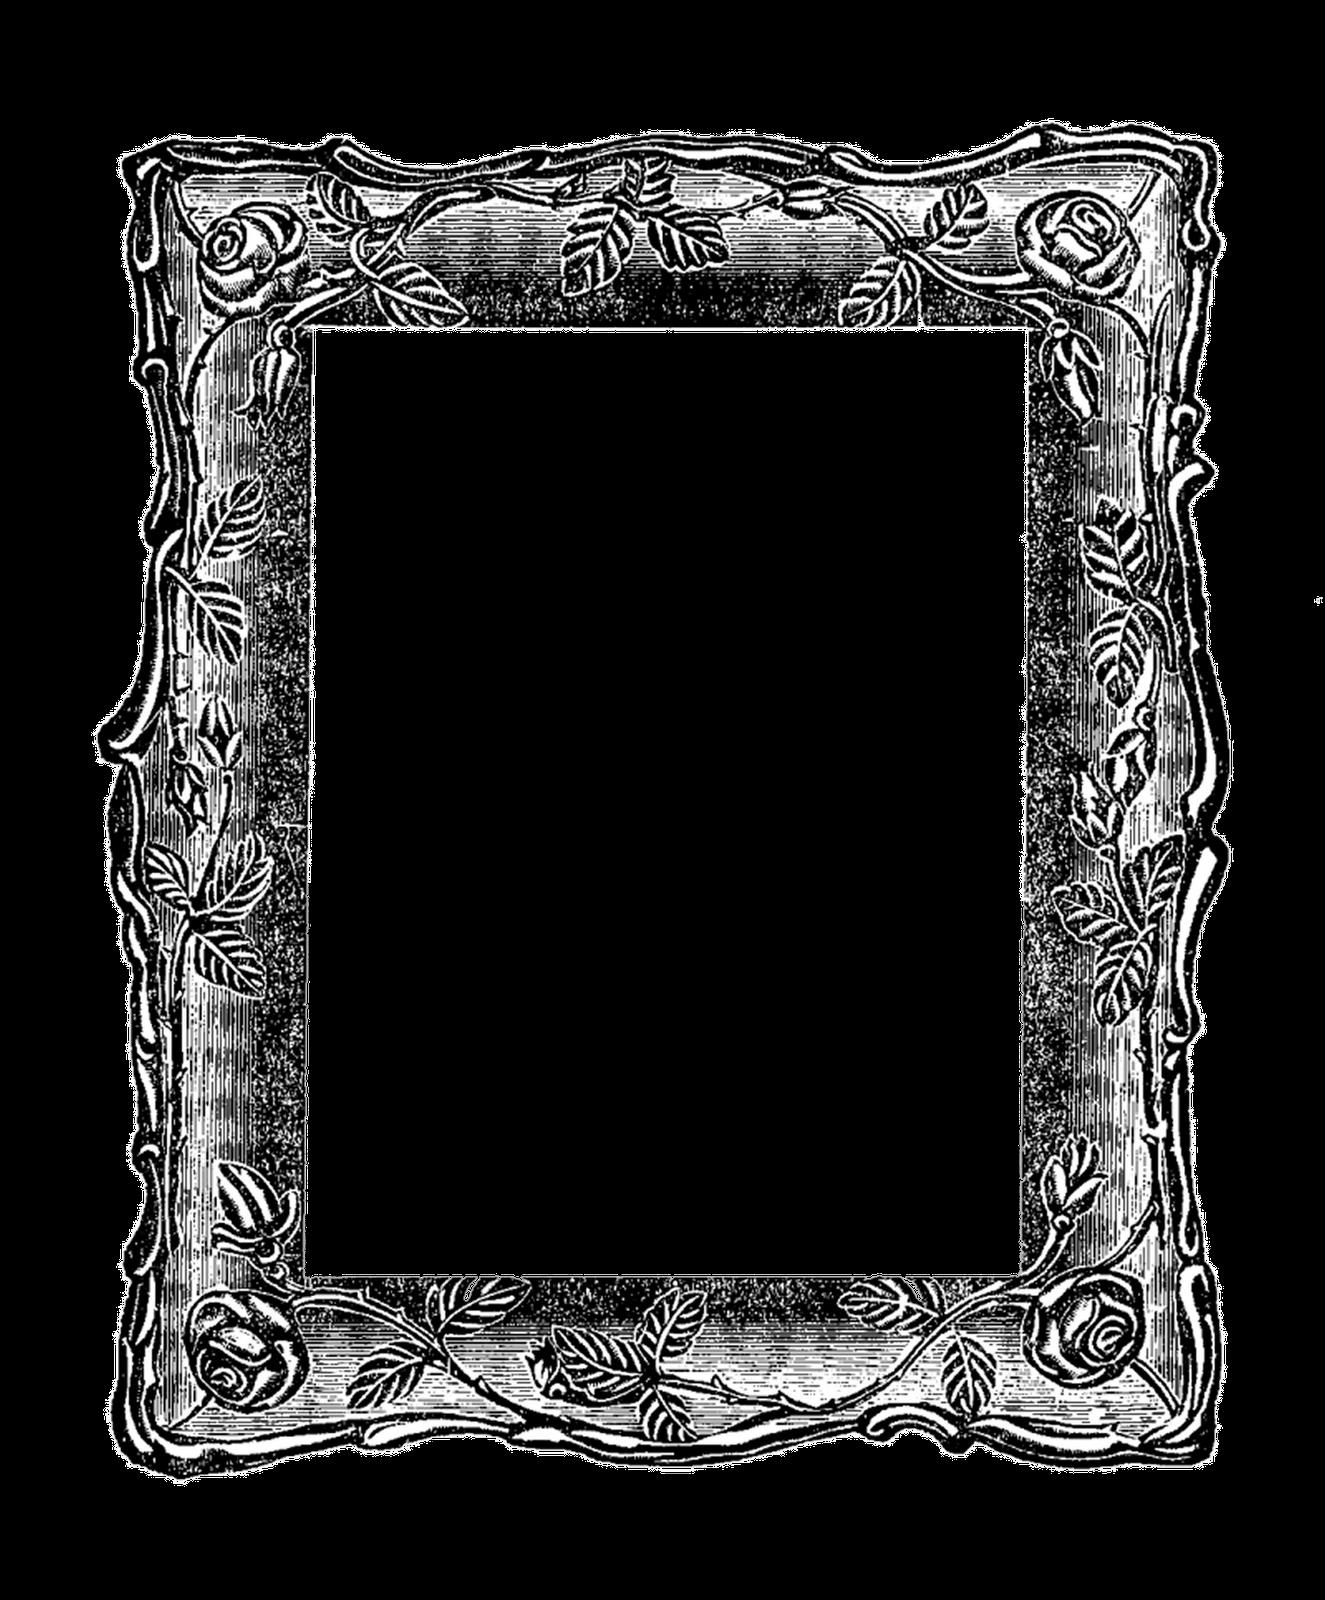 Antique Images Vintage Graphic Decorative Square Frame